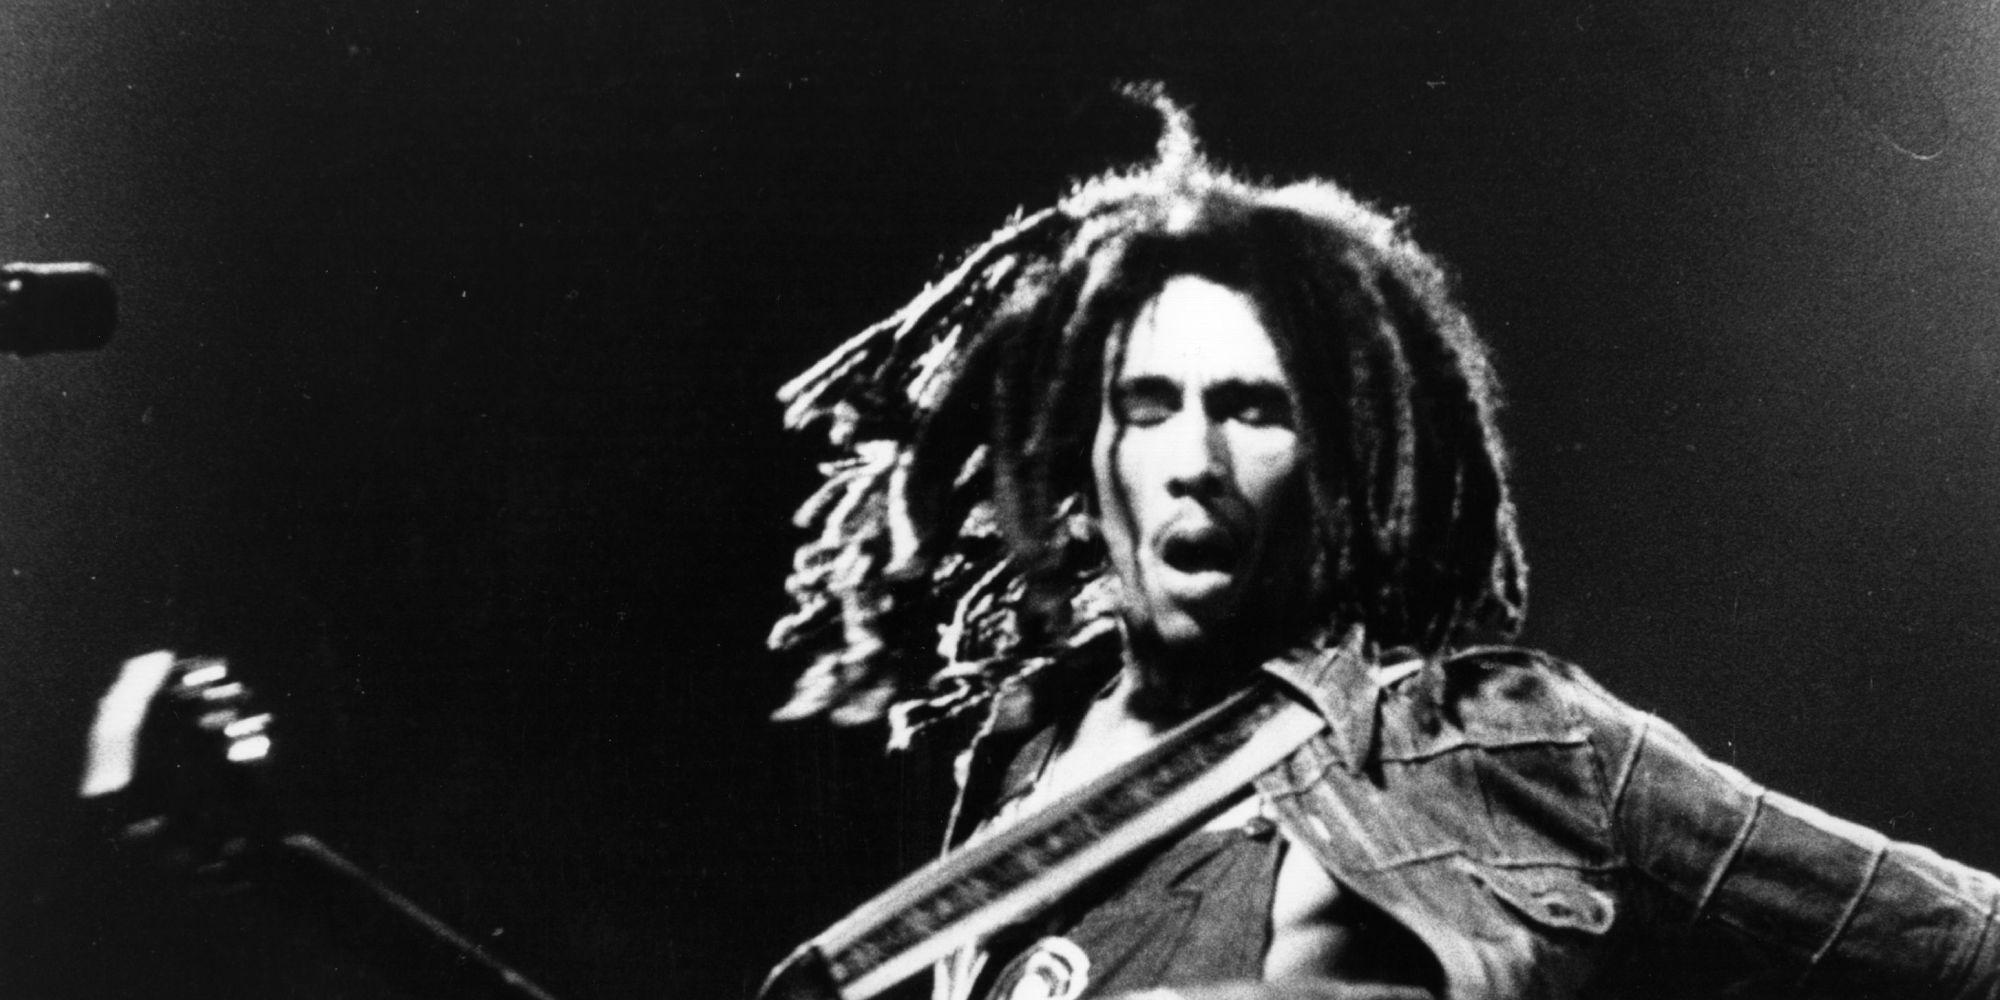 Bob Marley: Bob Marley Raised A Really Good Question About Marijuana